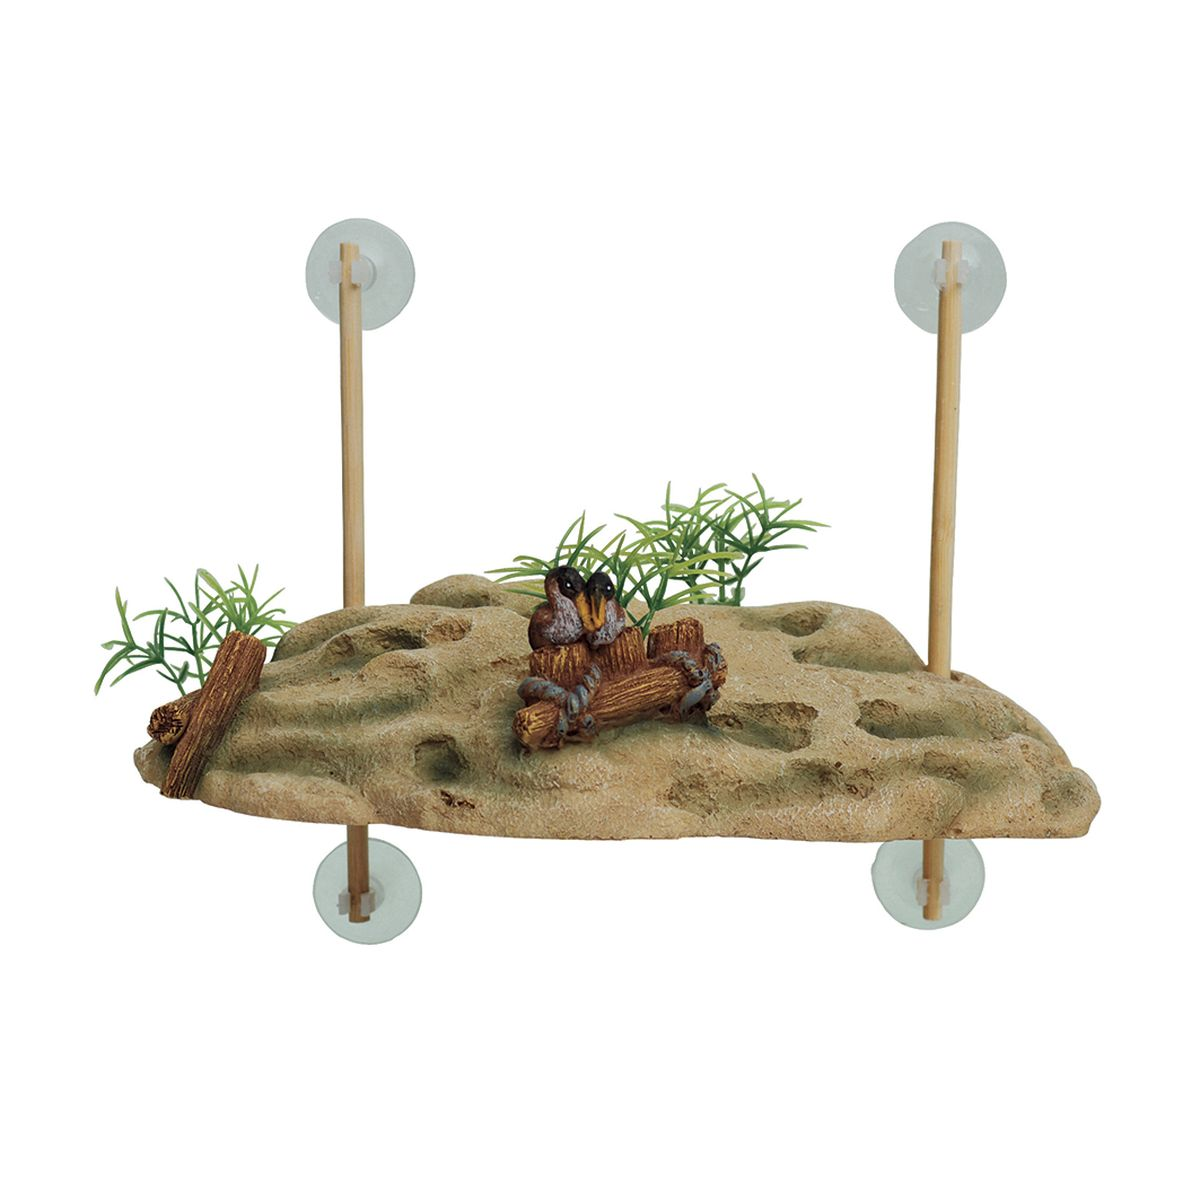 Декорация для аквариума ArtUniq Островок для черепах, на присосках, 24,5 x 11,5 x 7,5 см декорация для аквариума artuniq пористый камень 20 5 x 10 5 x 18 8 см